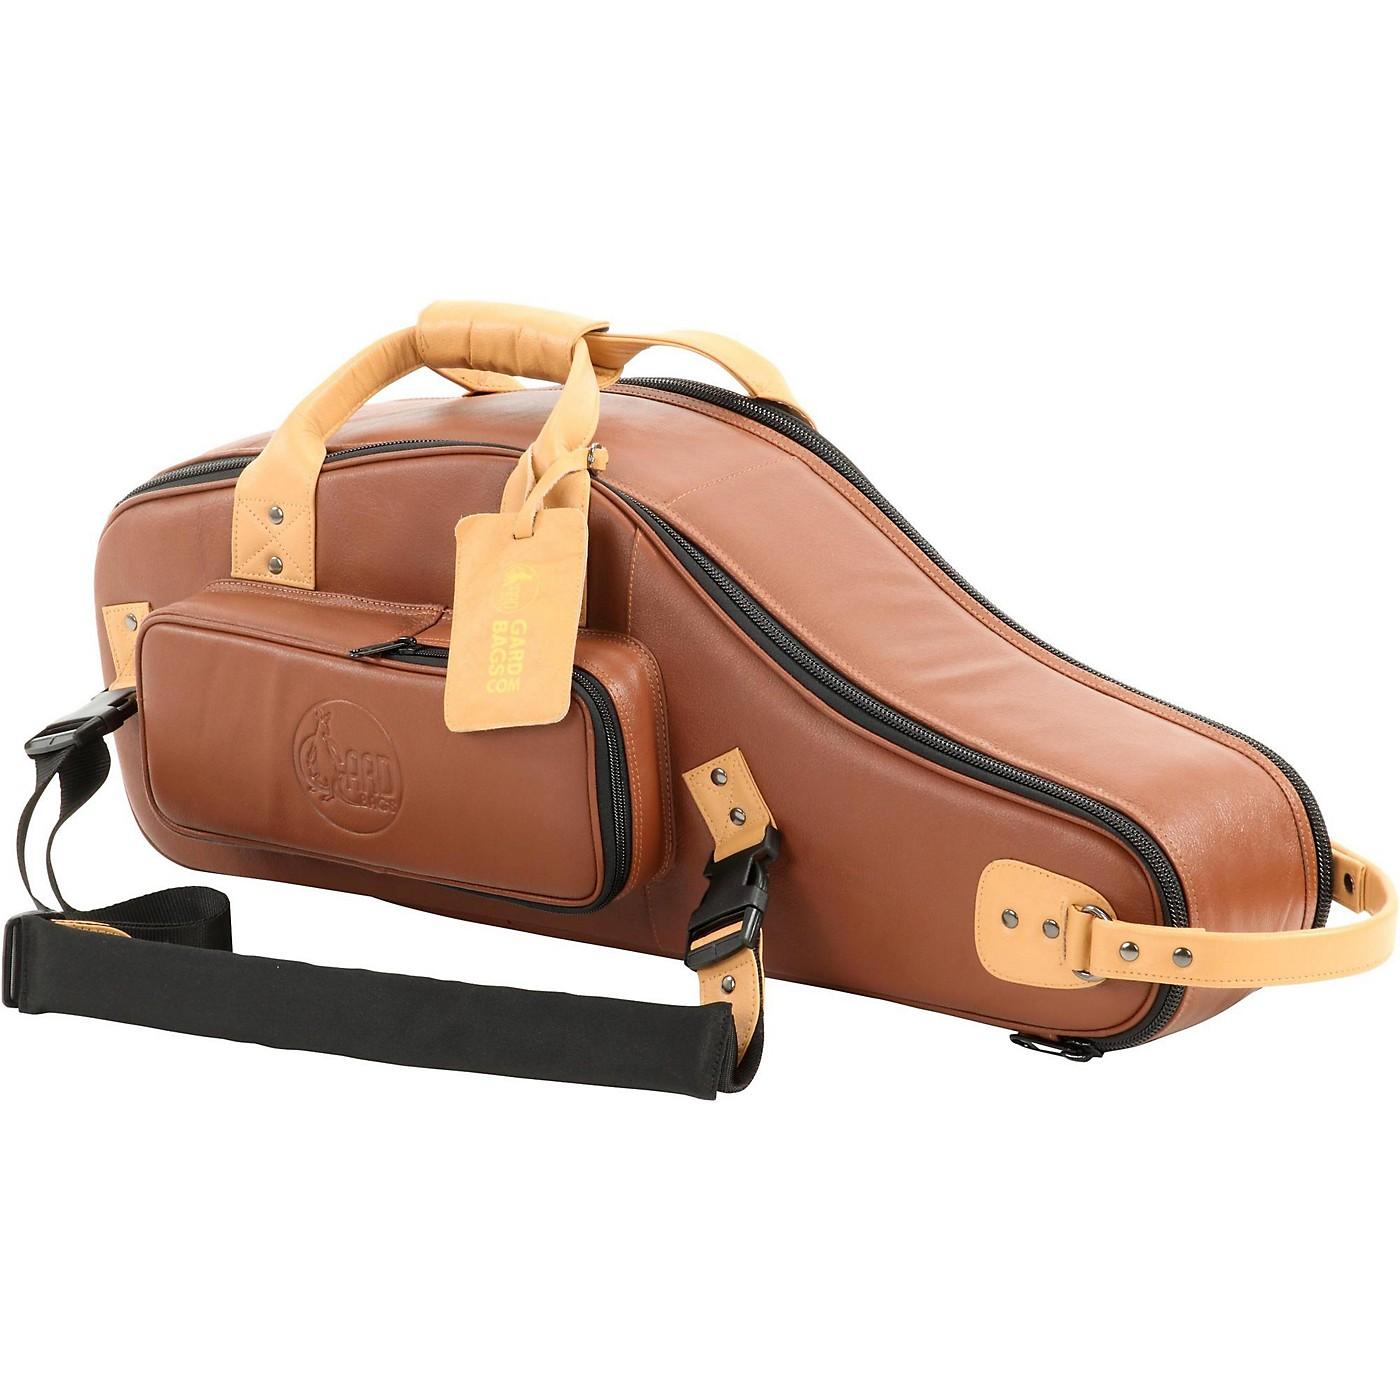 Gard Designer Leather Alto Saxophone Gig Bag thumbnail